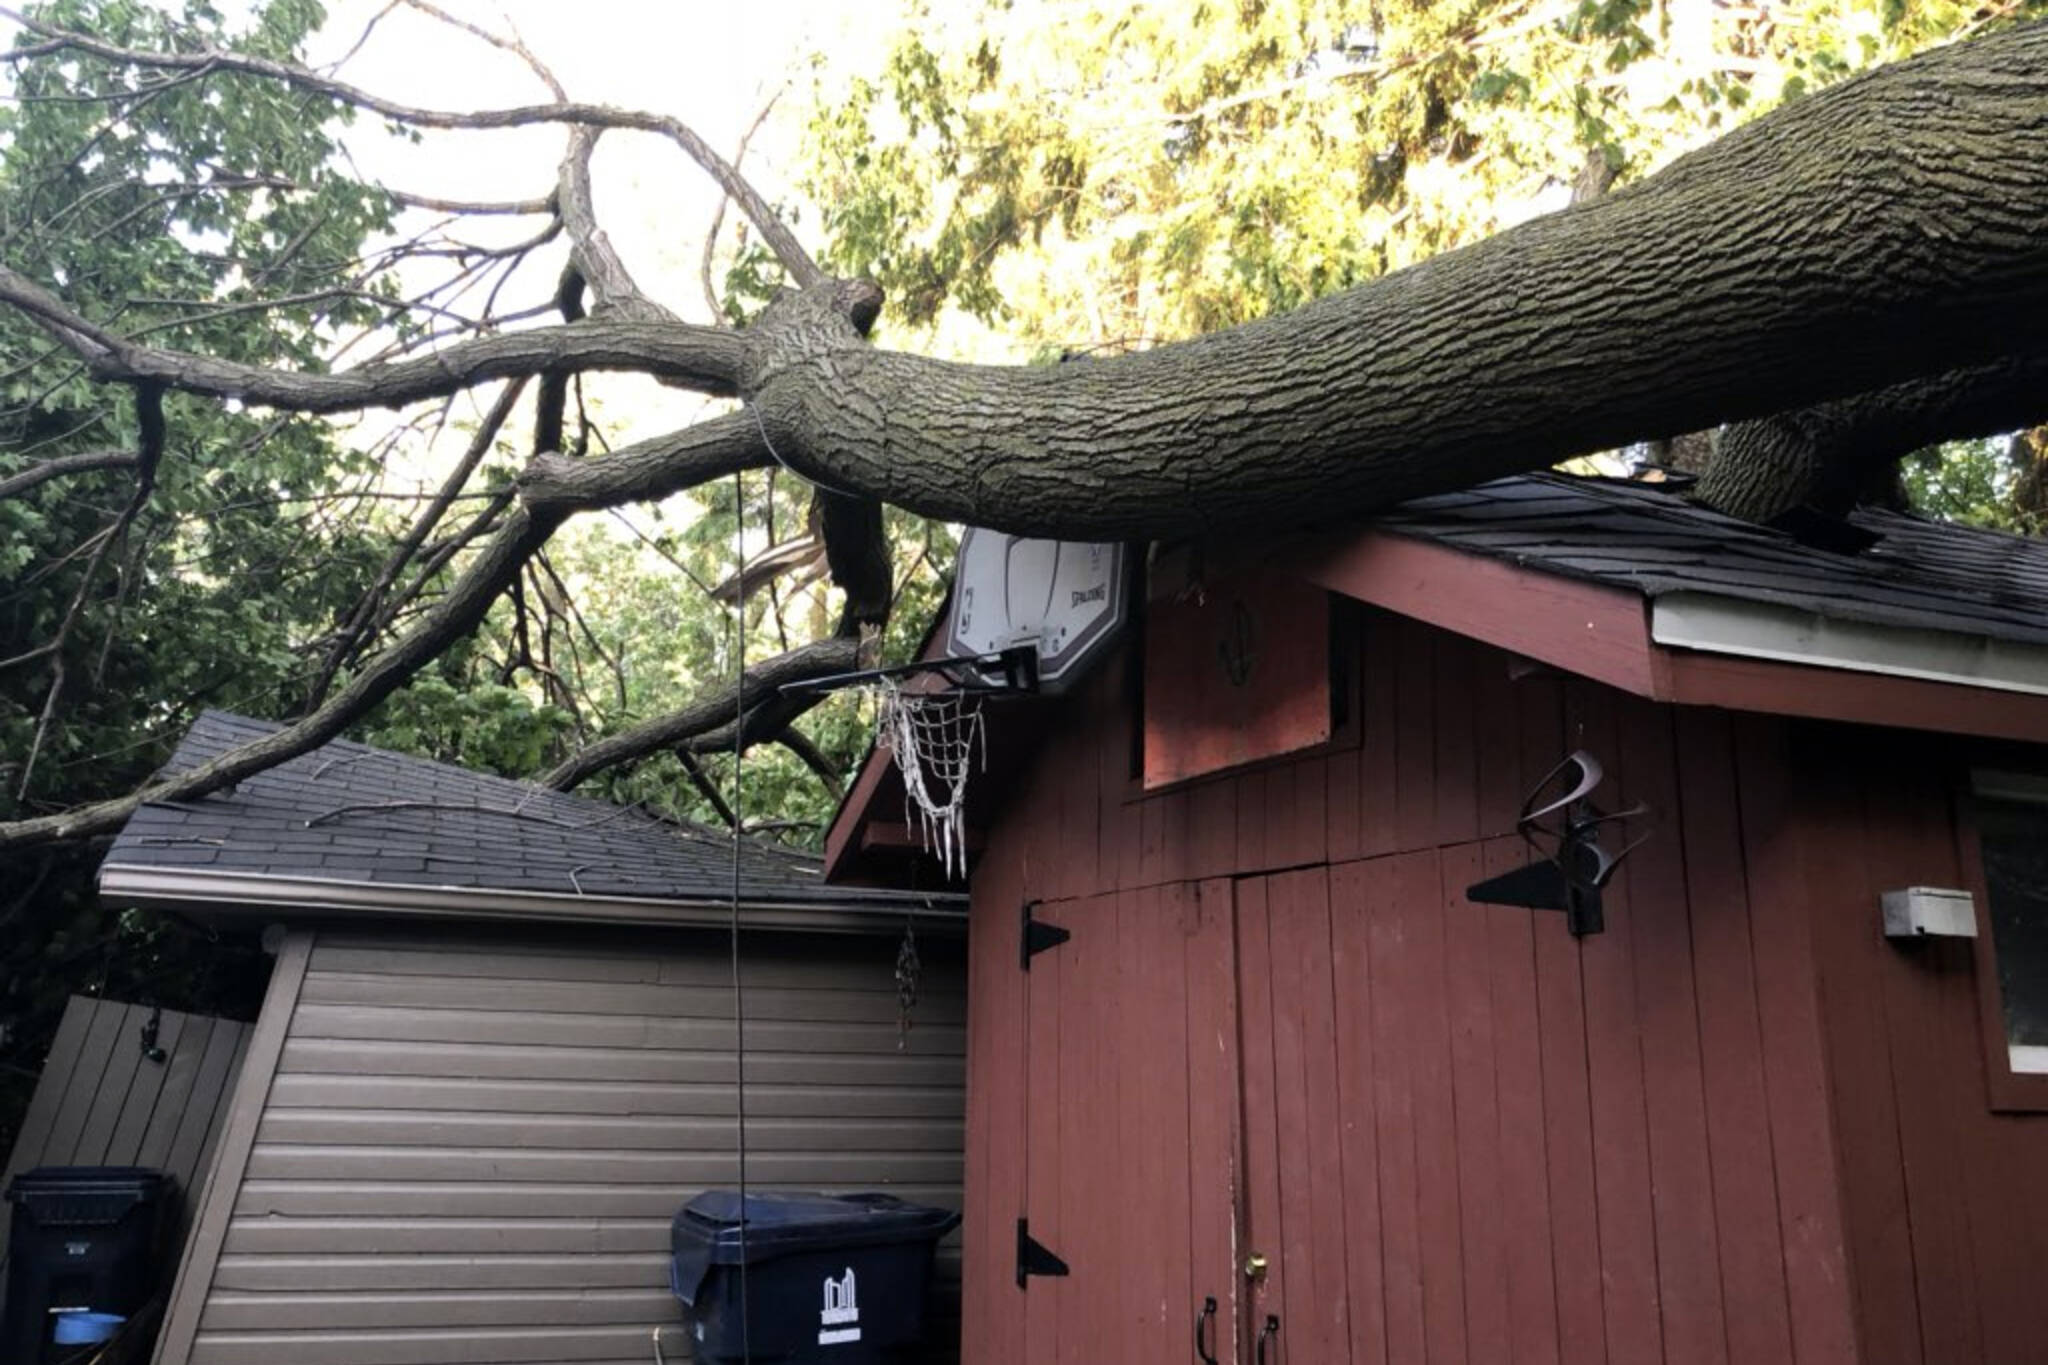 Toronto storm damage